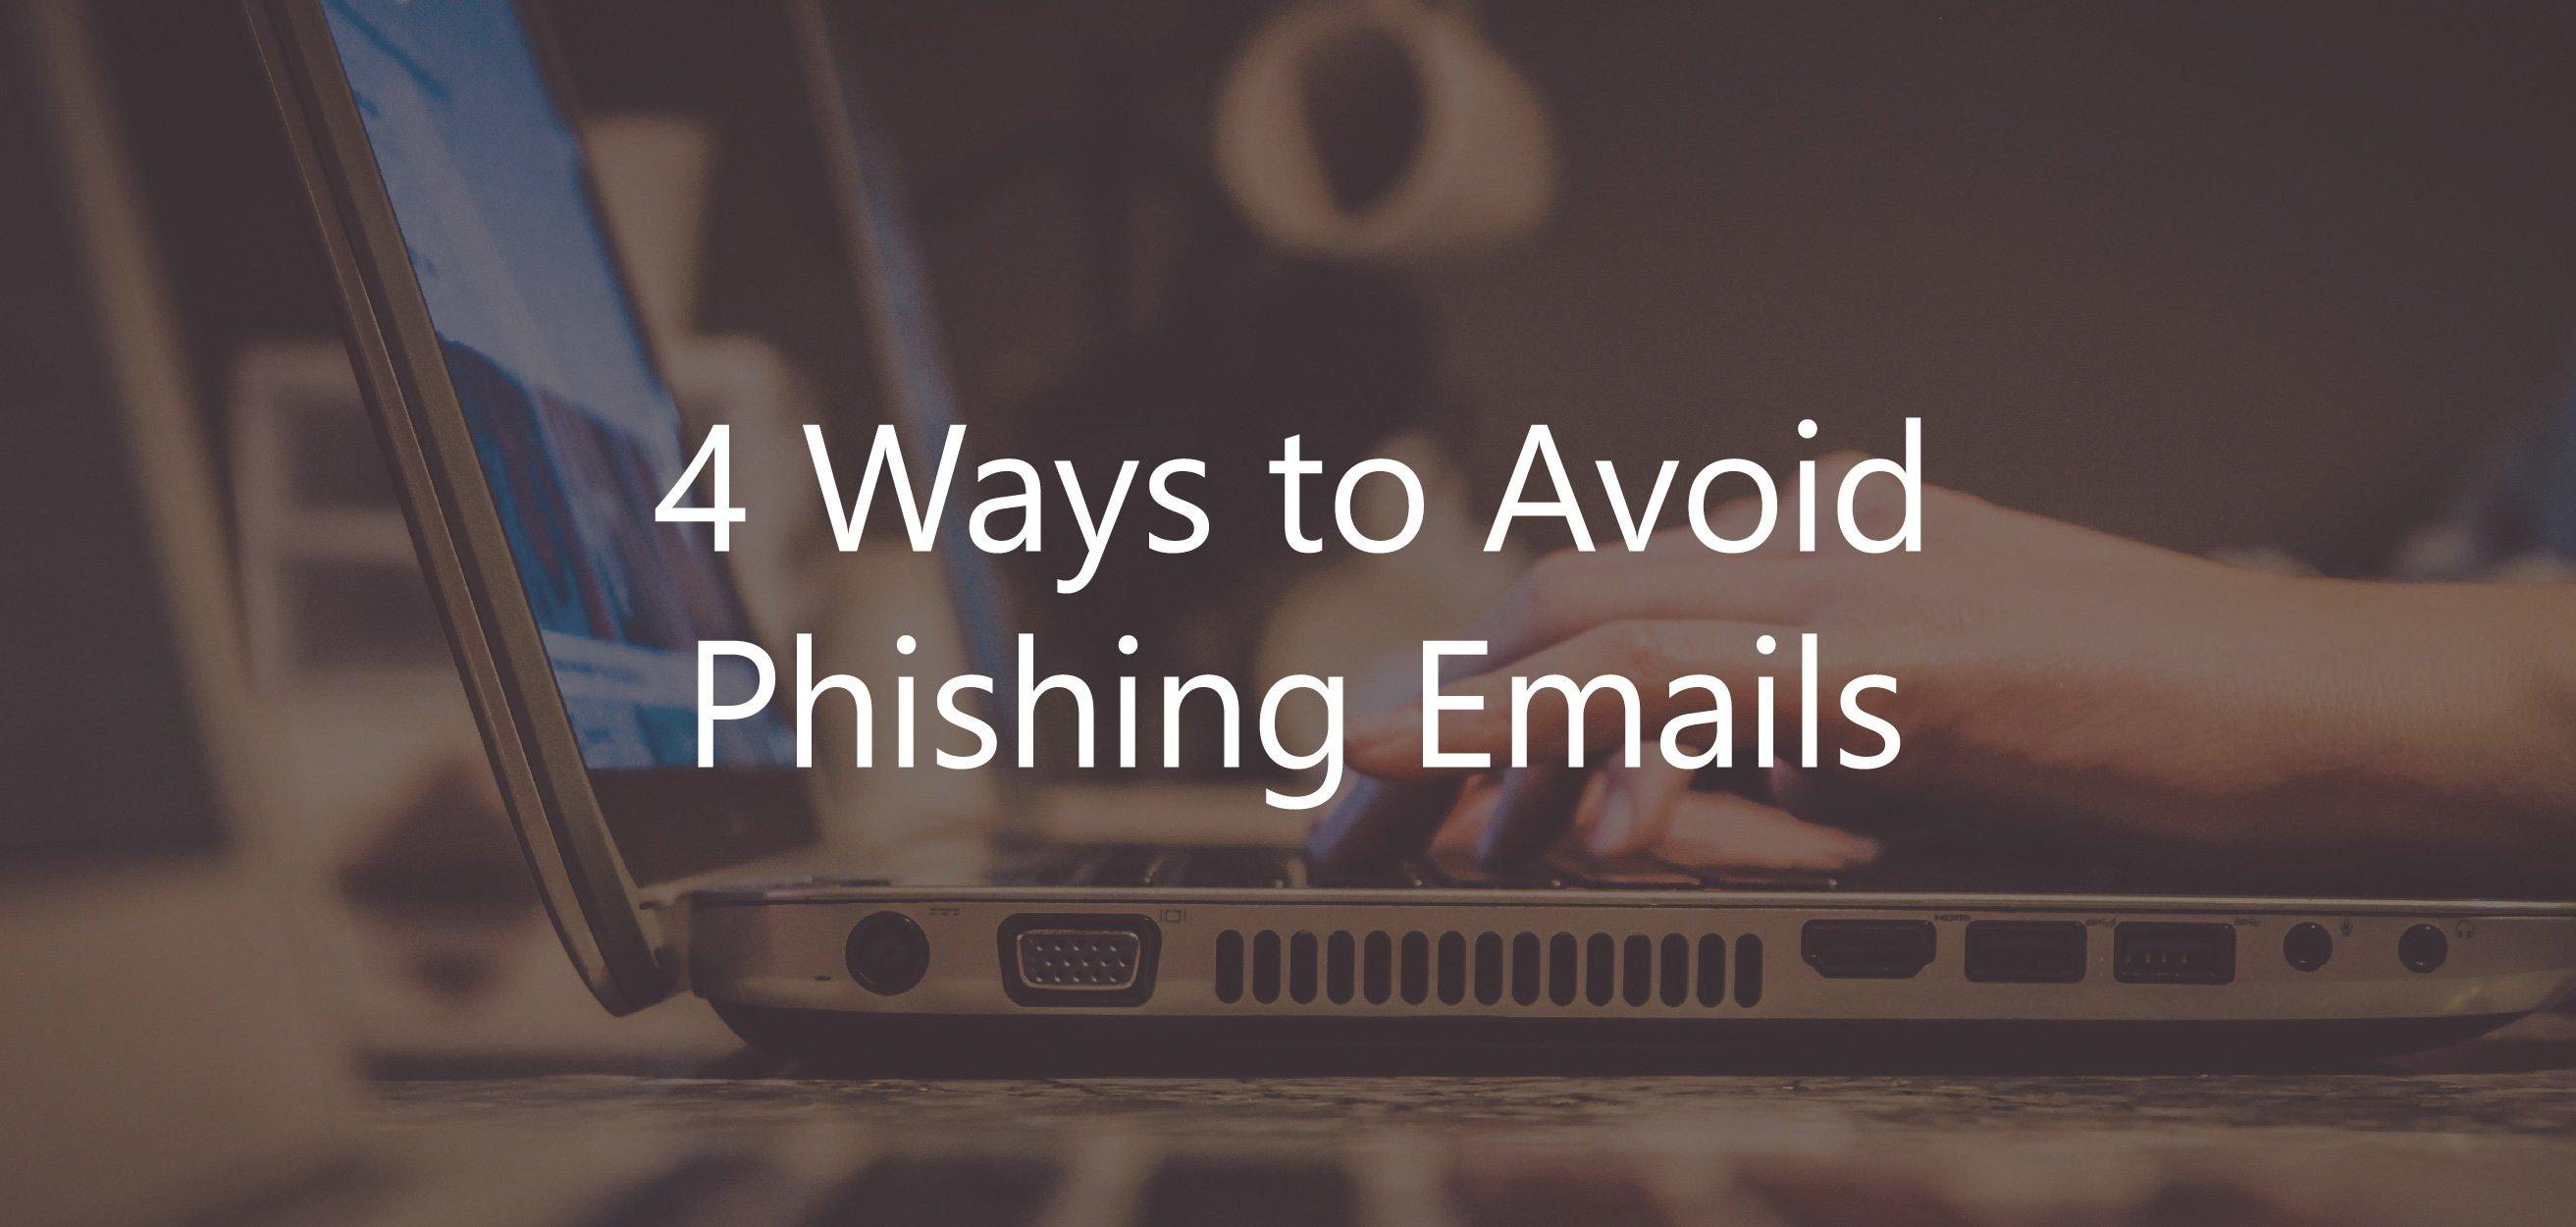 4 ways to avoid phishing emails